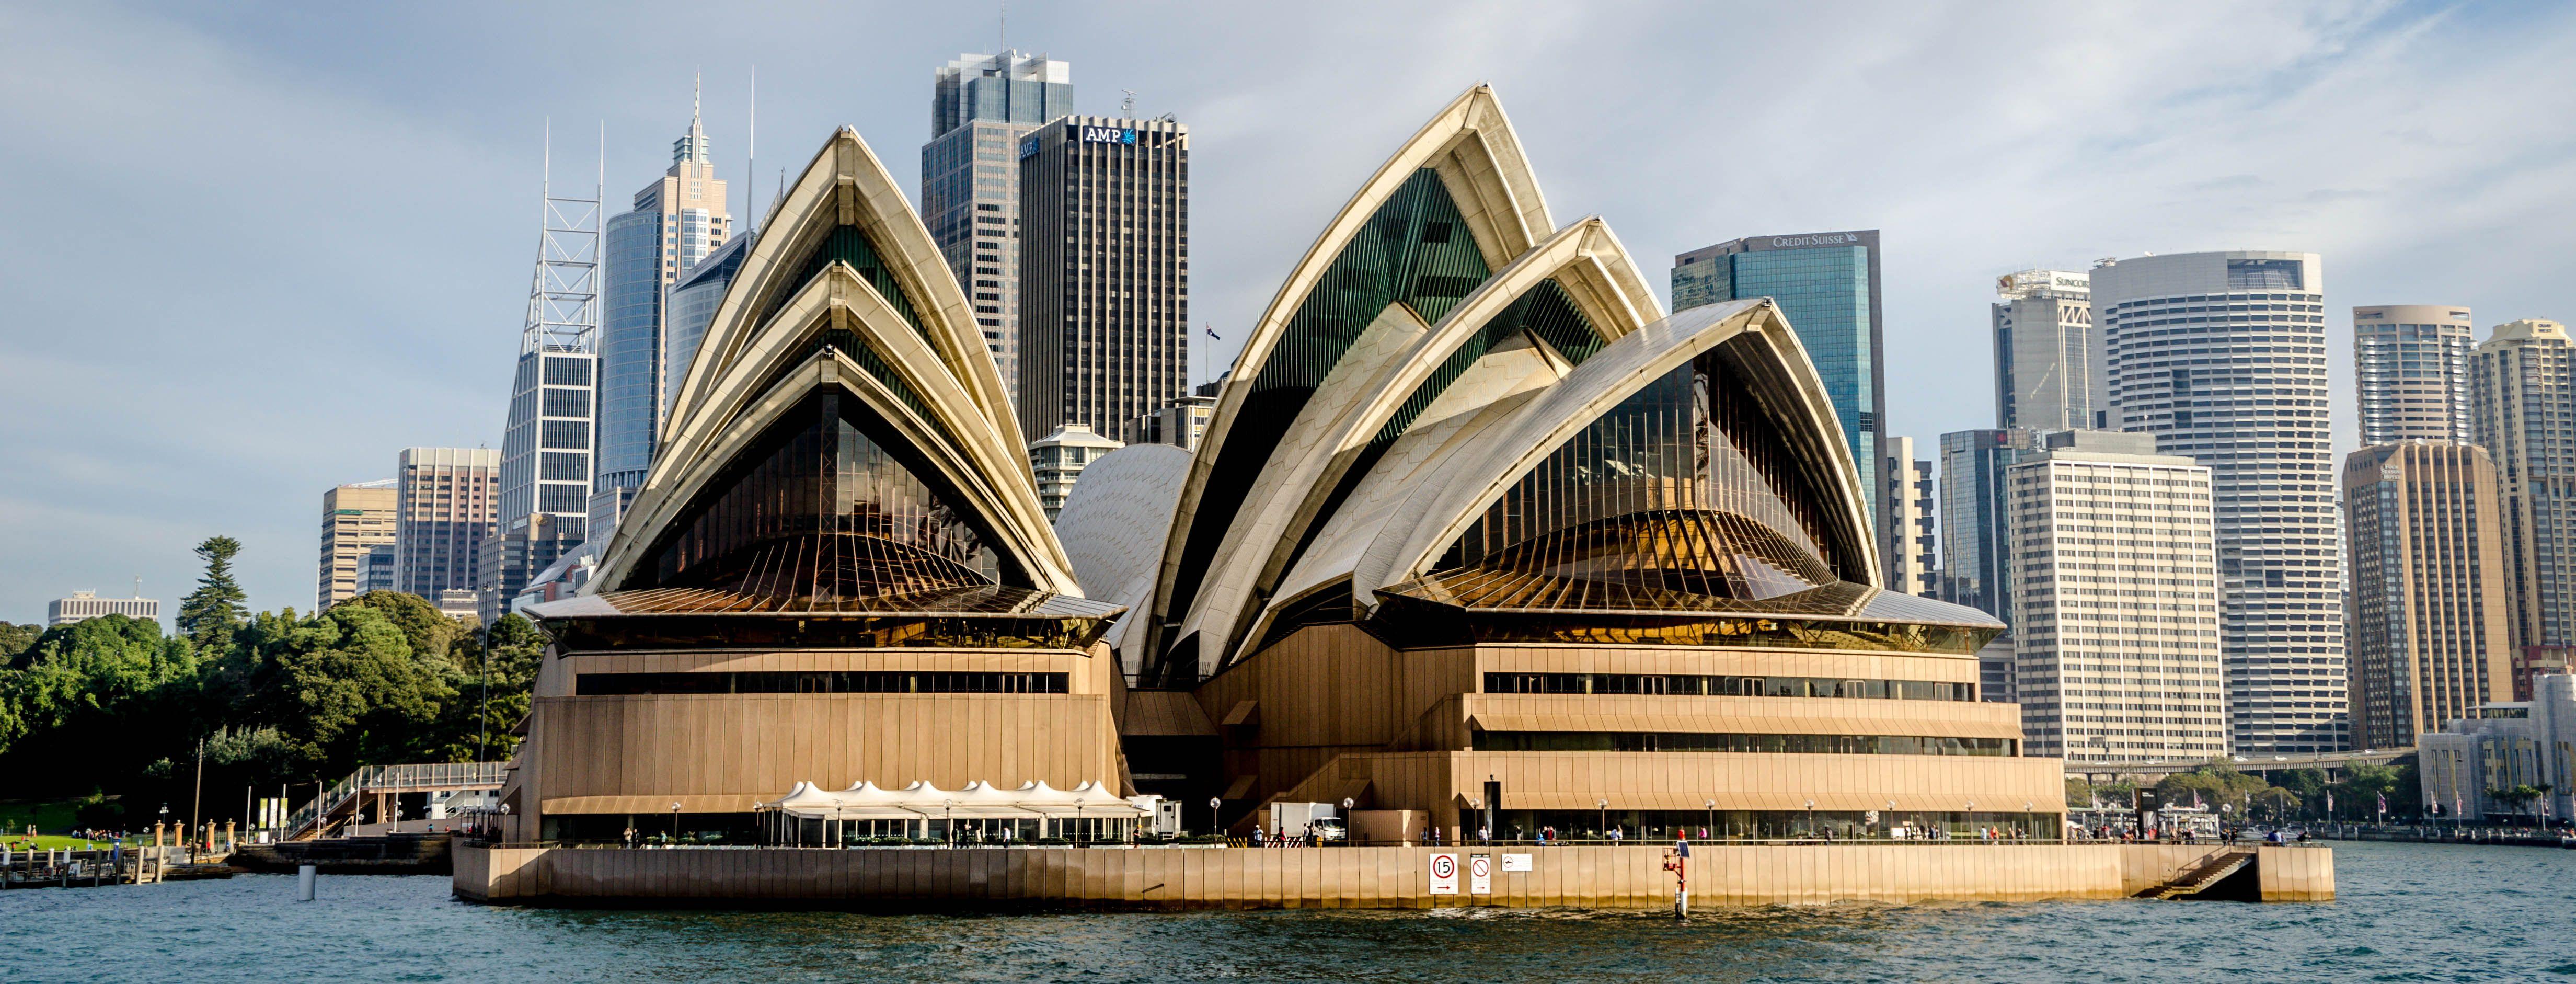 sydney opera house modern architecture